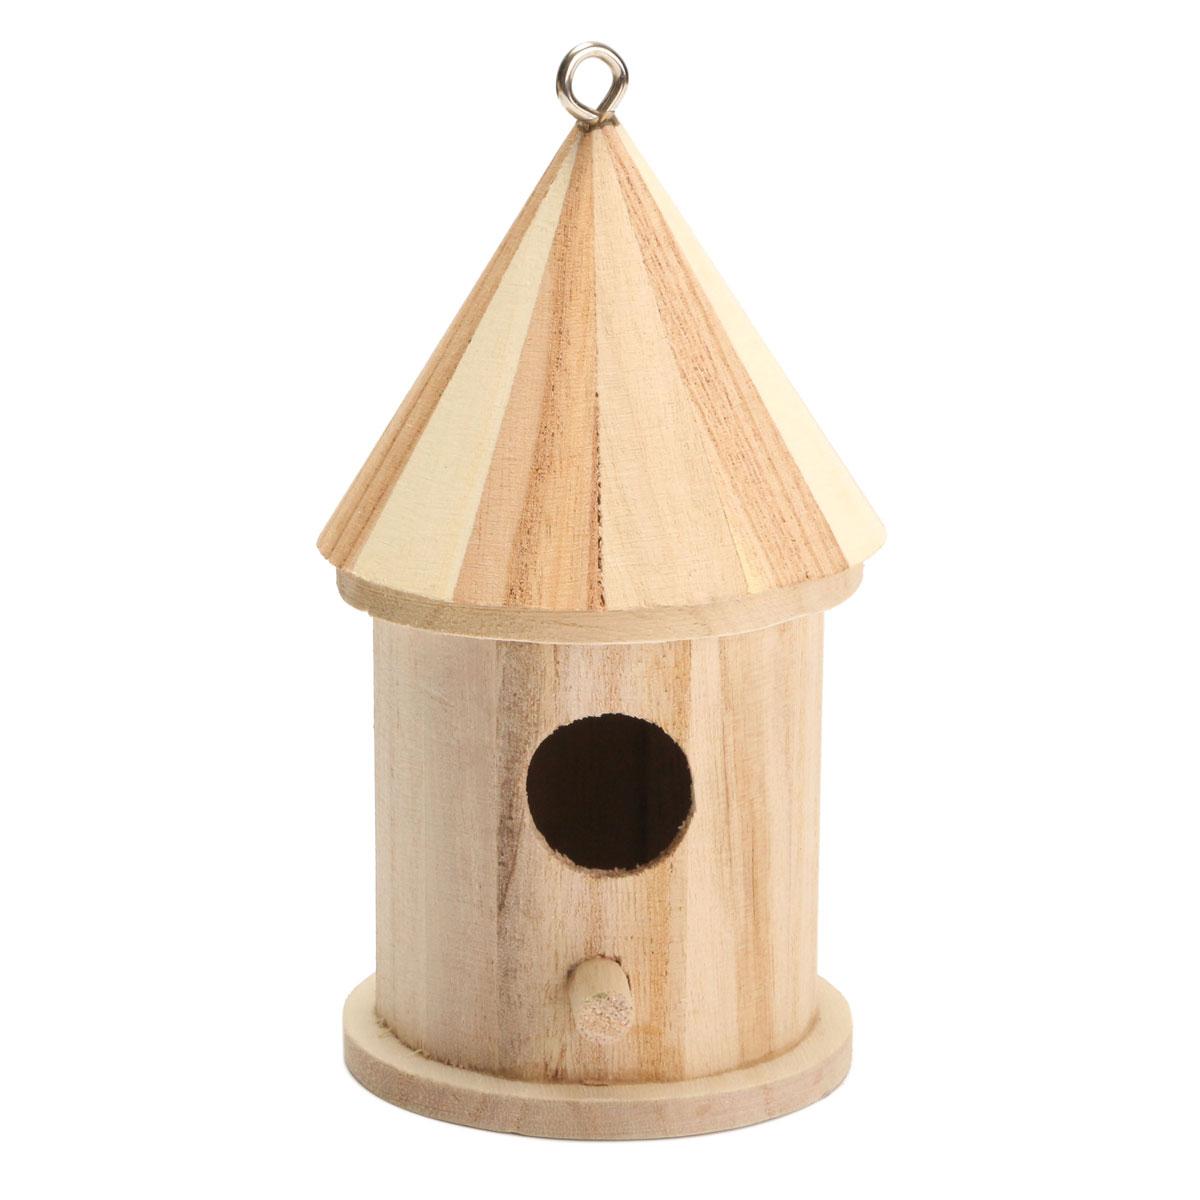 New wooden bird house birdhouse hanging nest nesting box for Oiseau decoration jardin